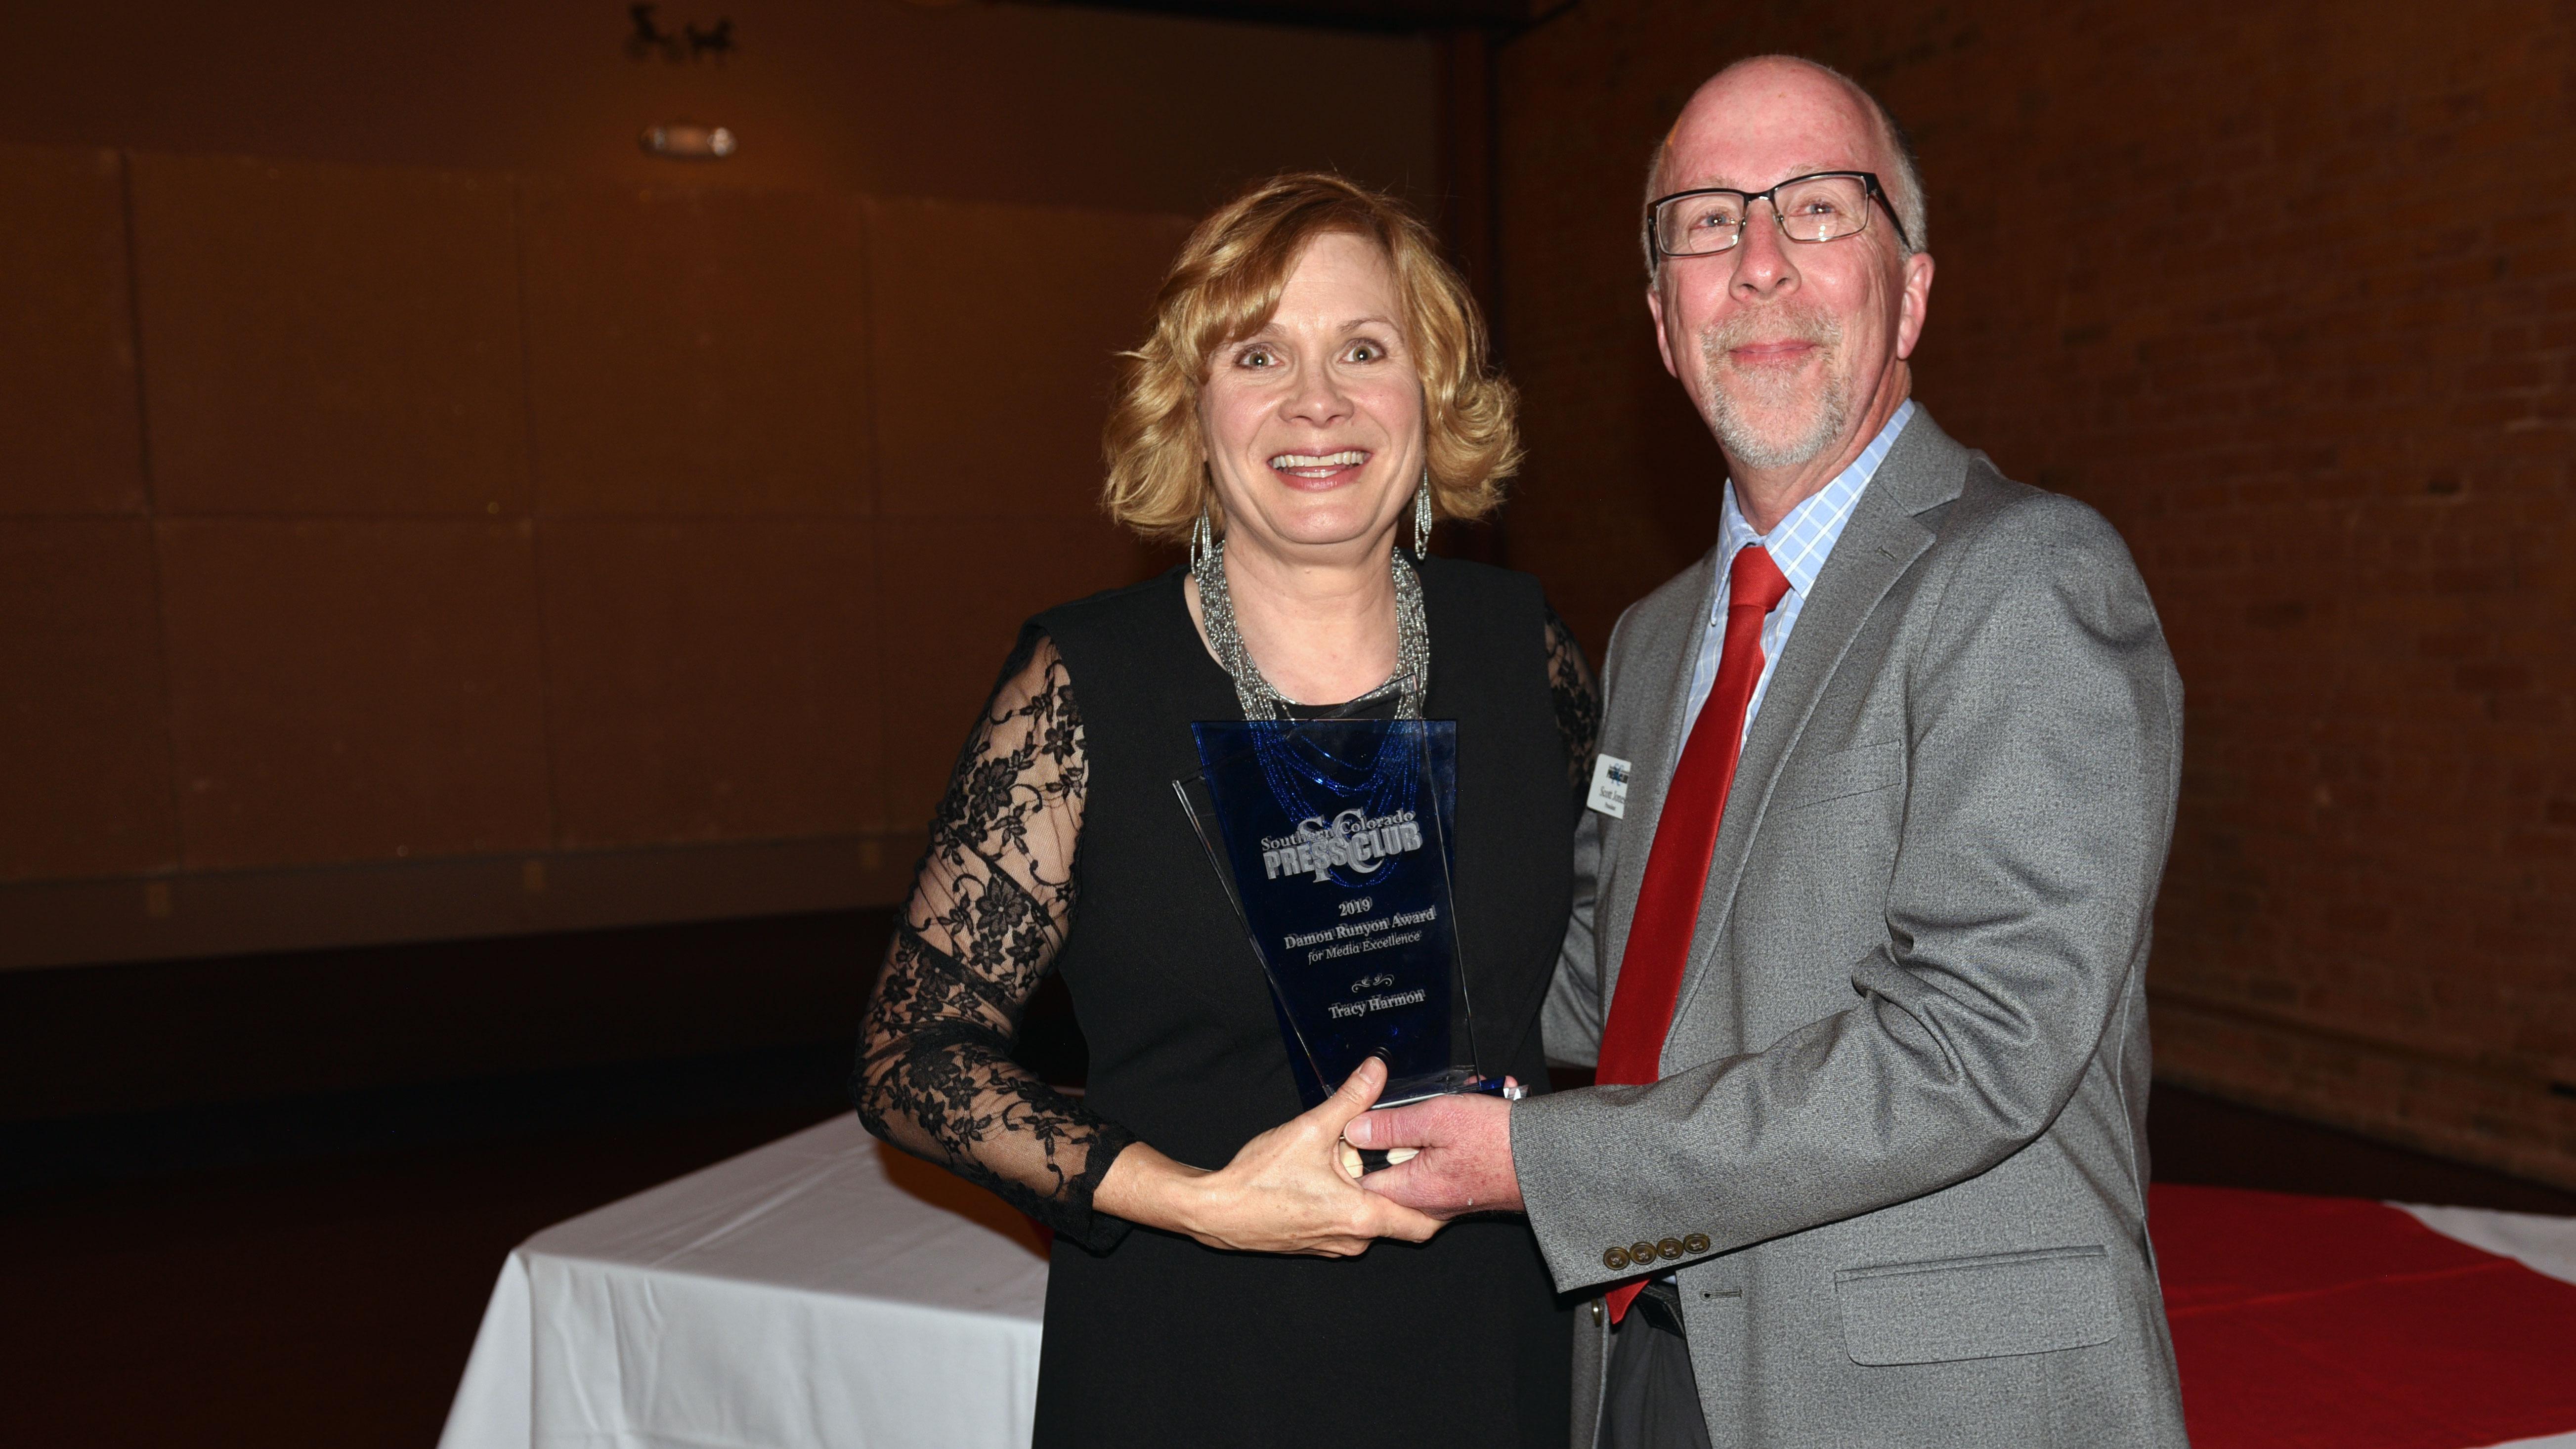 Damon Runyon Award winner Tracy Harmon with SCPC President Scott Jones